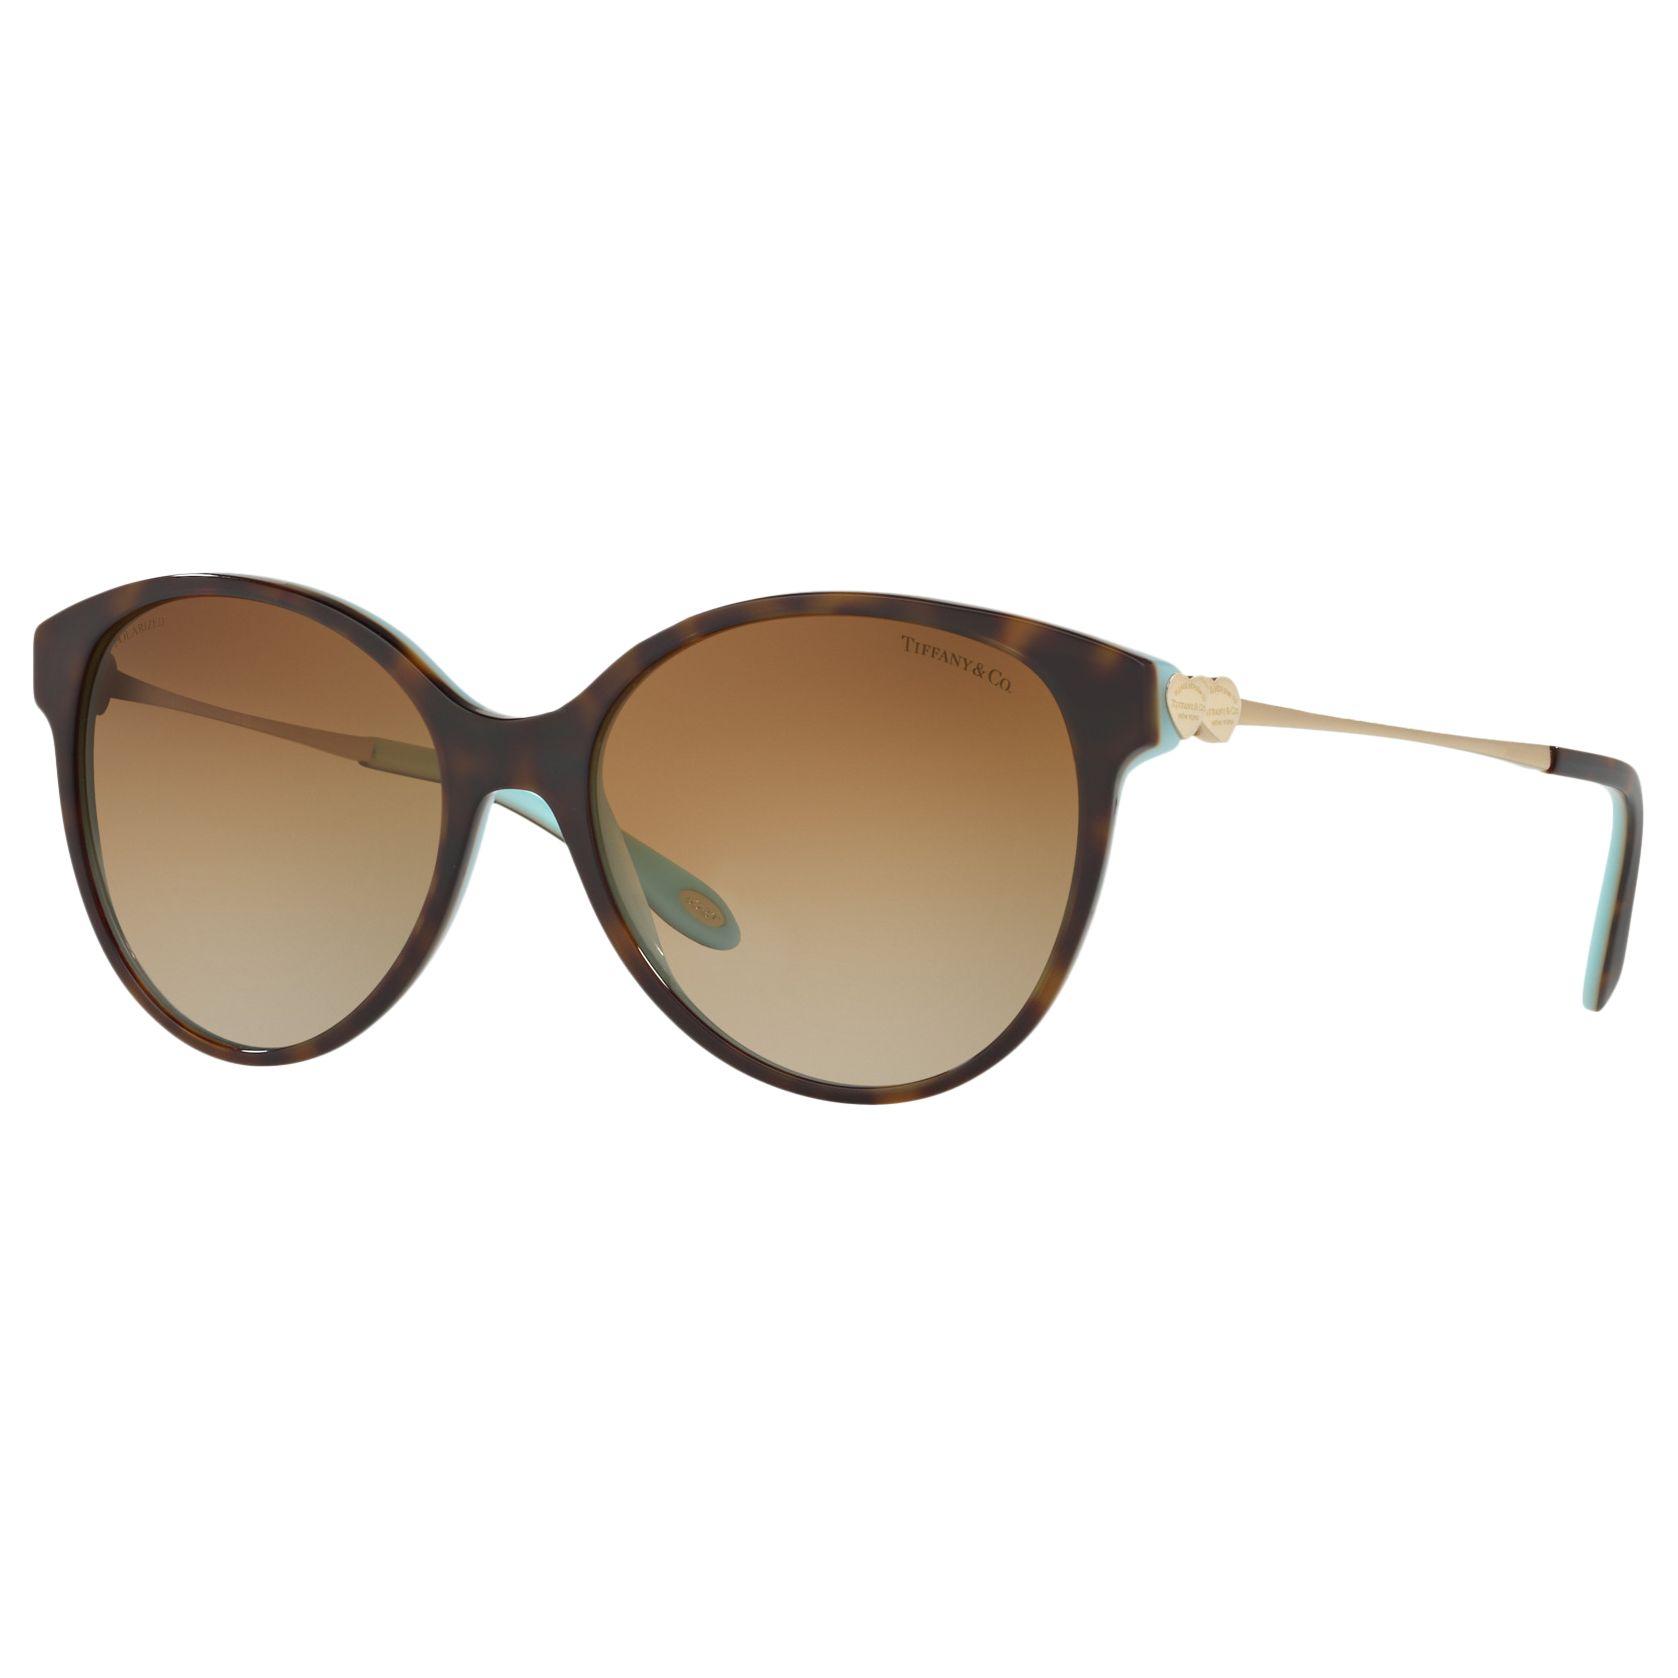 Tiffany & Co Tiffany & Co TF4127 Polarised Oval Sunglasses, Tortoise/Brown Gradient